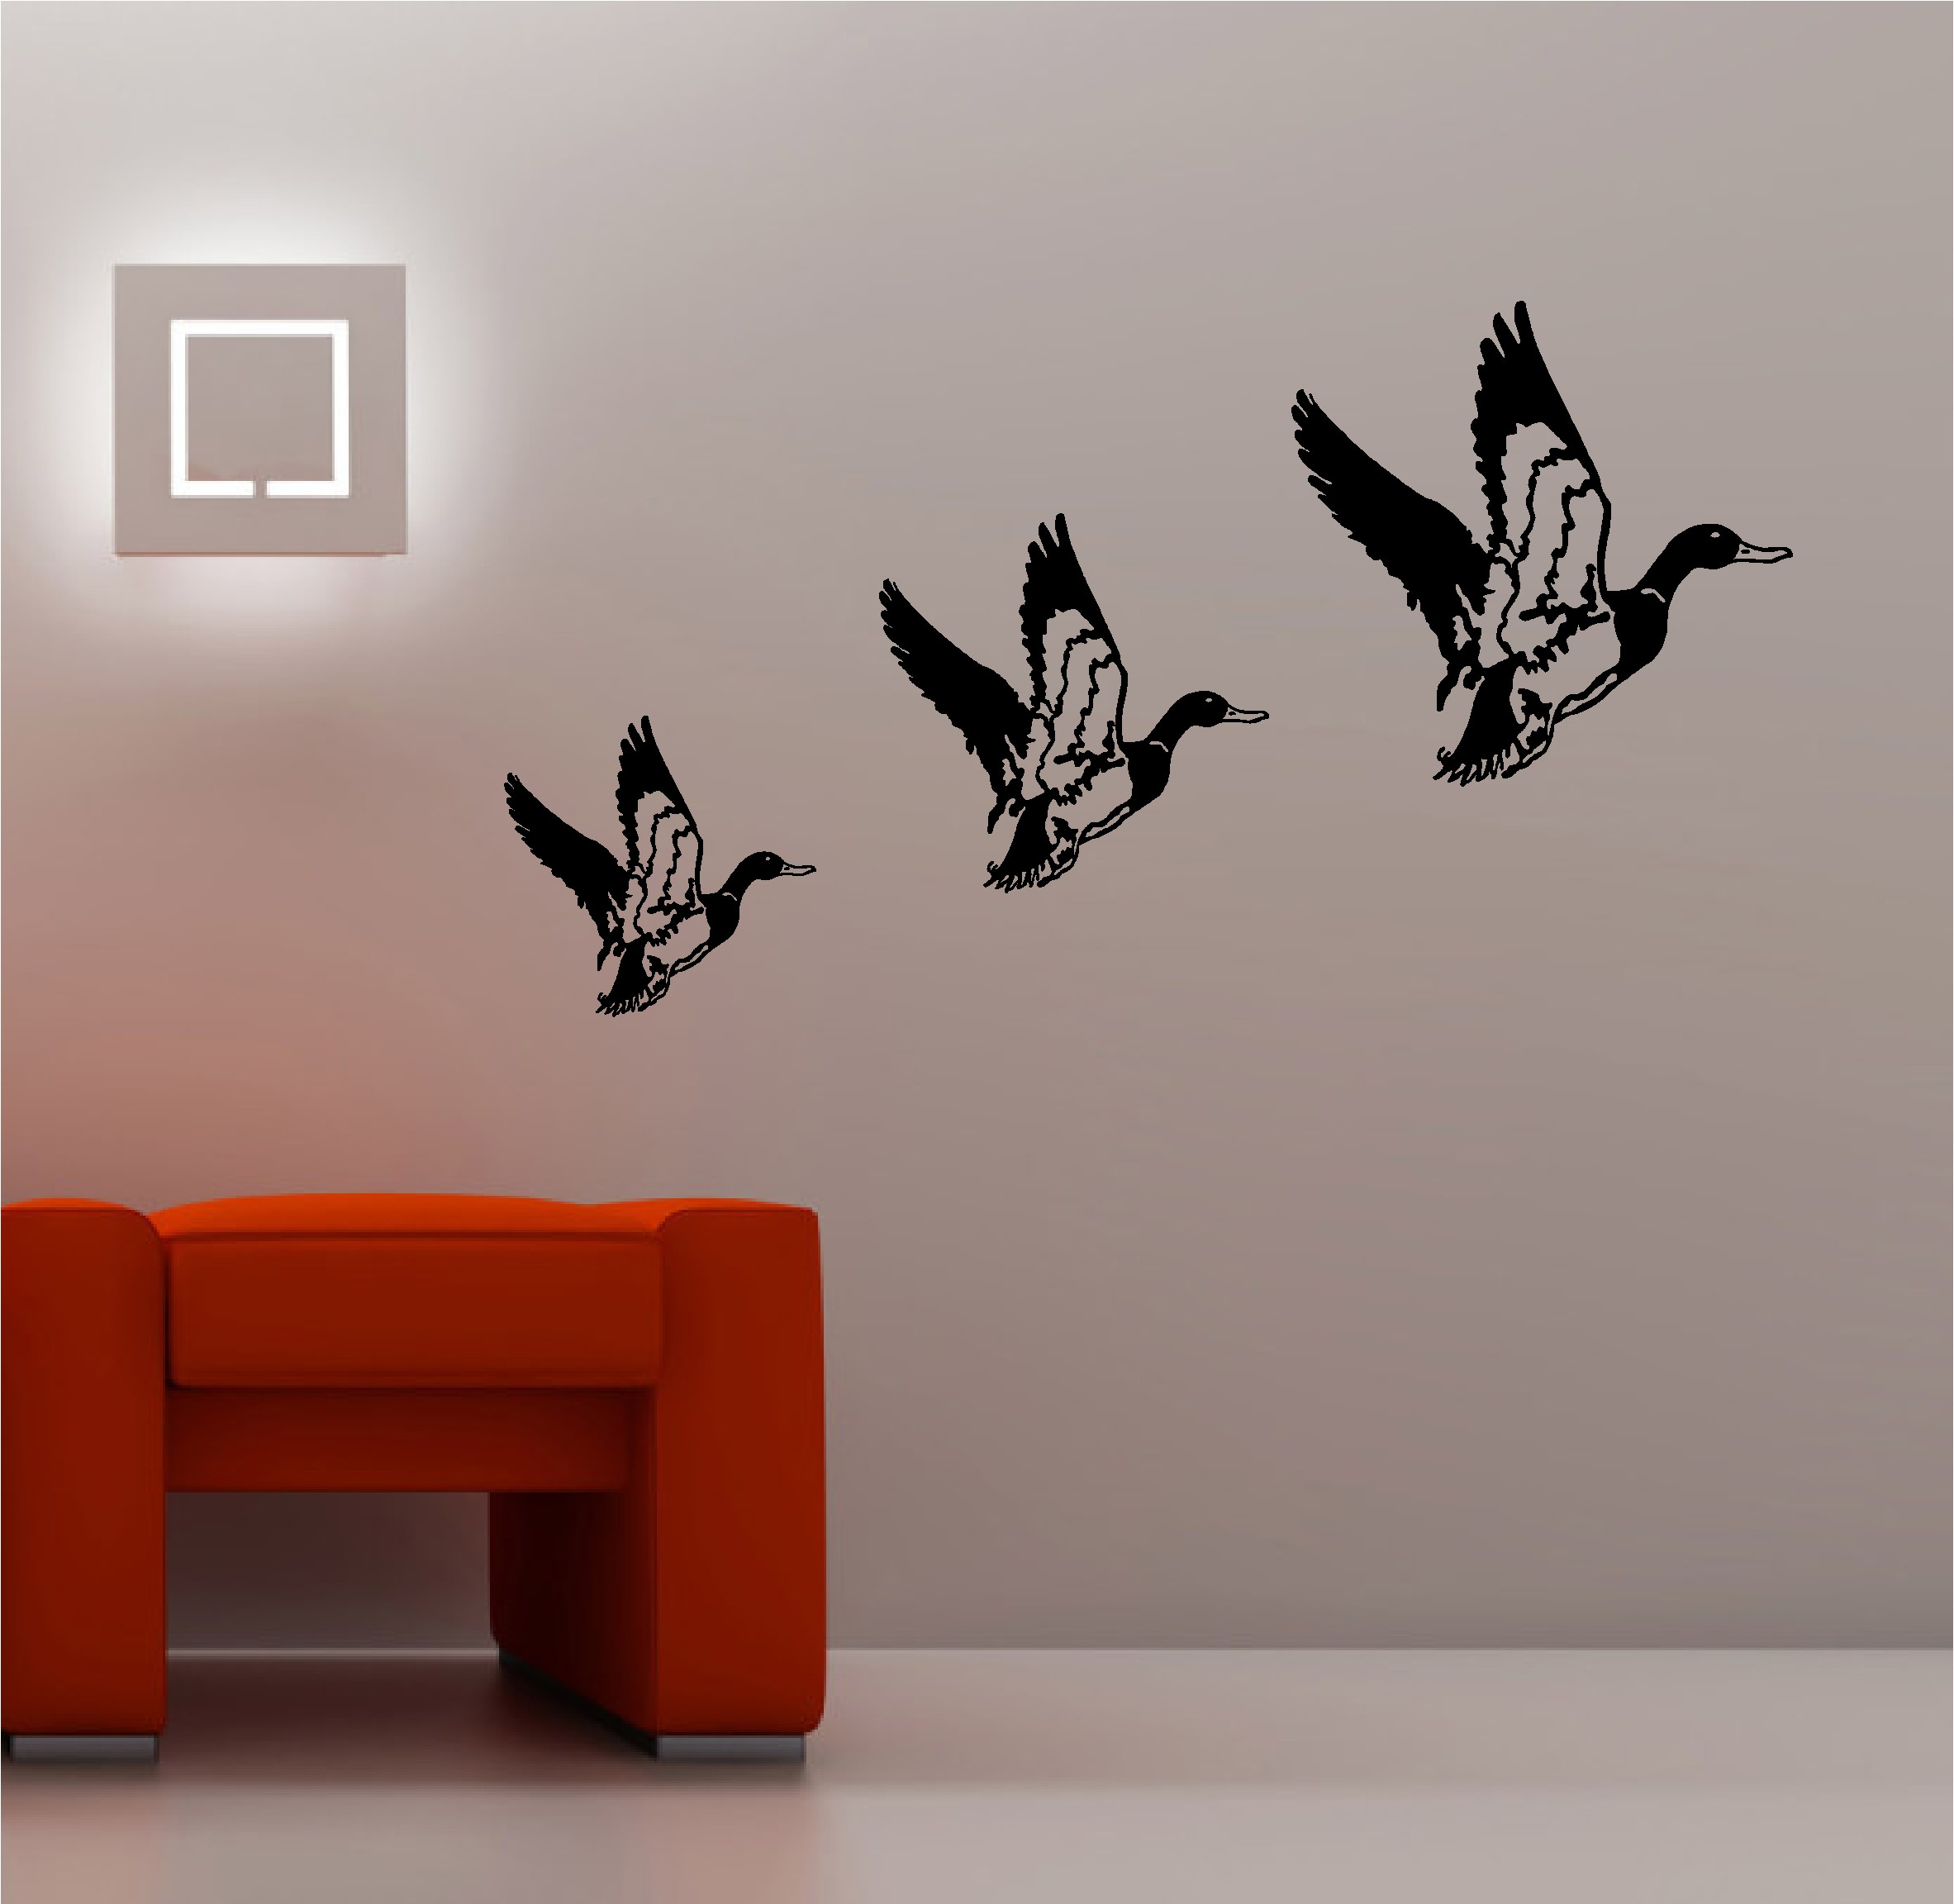 Best ideas about Vinyl Wall Art . Save or Pin 3 X RETRO FLYING DUCKS wall art sticker vinyl LOUNGE Now.